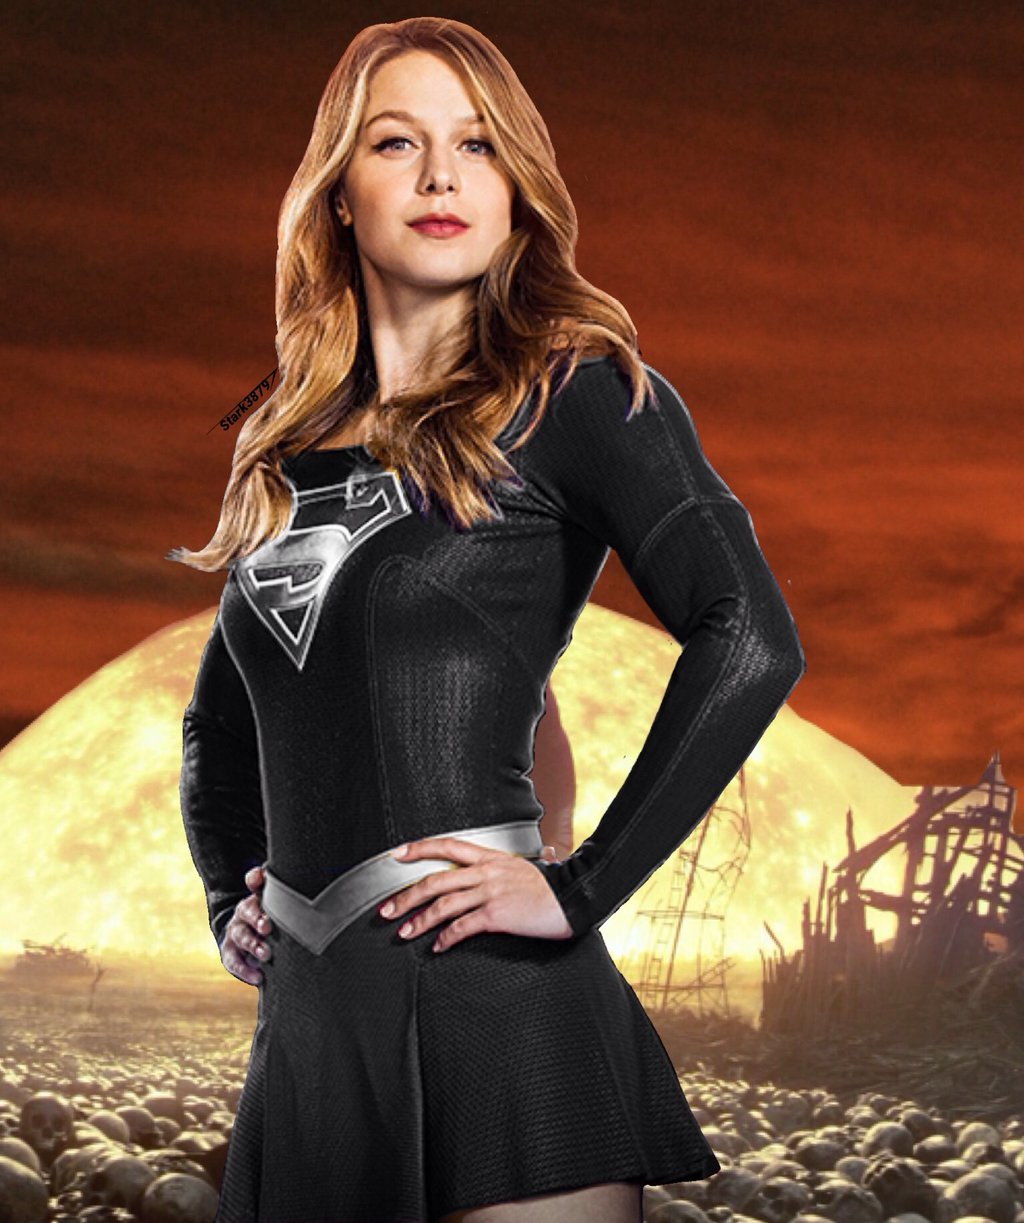 supergirl_black_suit_by_stark3879-darz65o.jpg